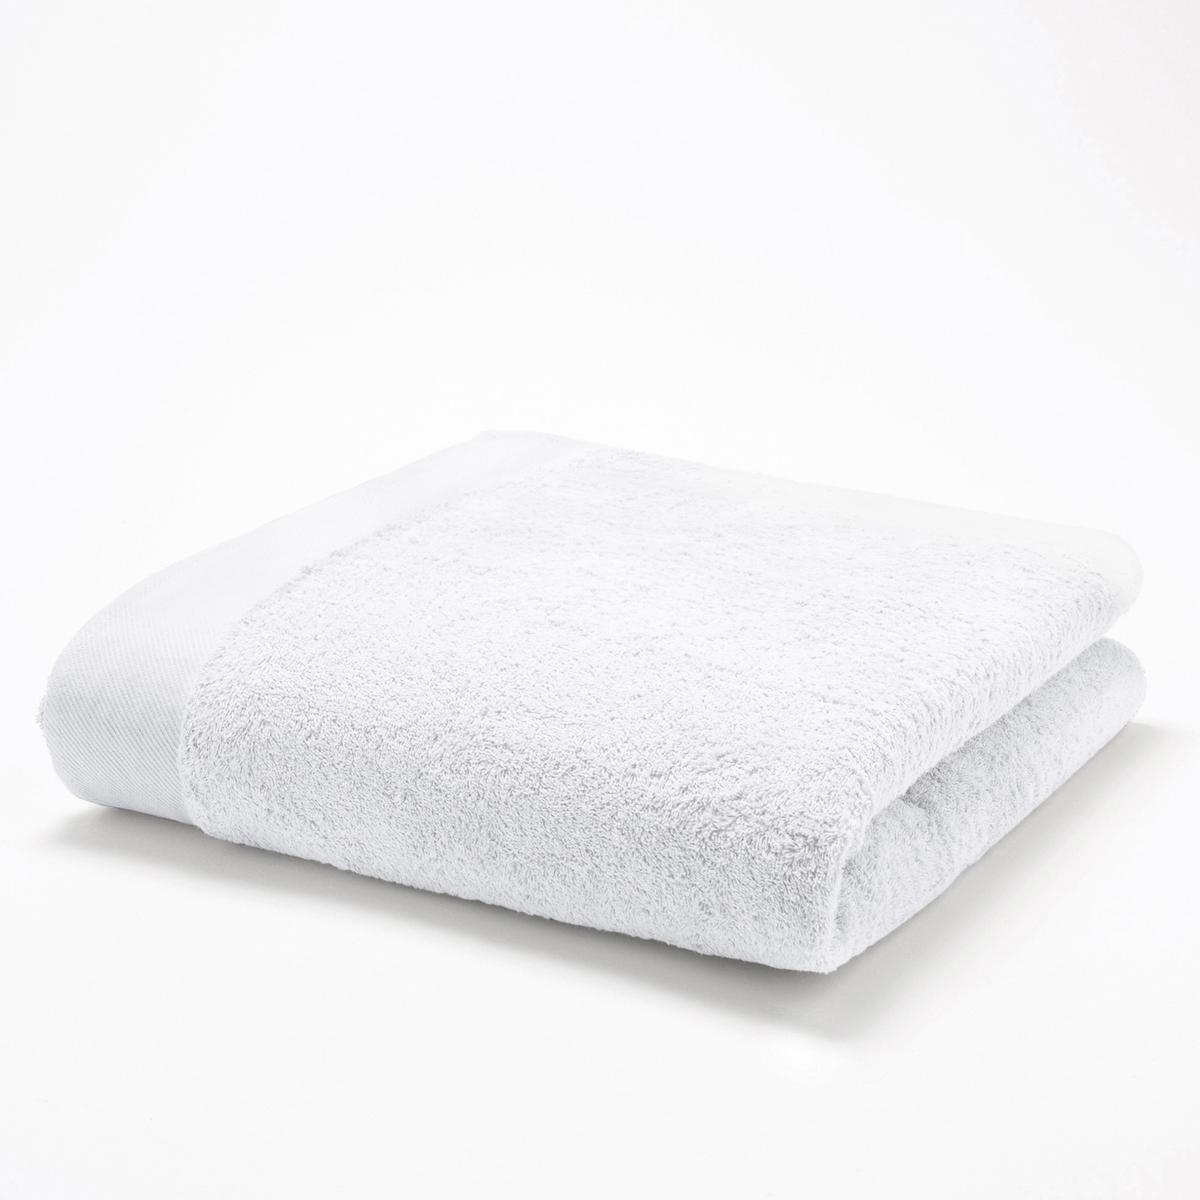 Полотенце банное от La Redoute